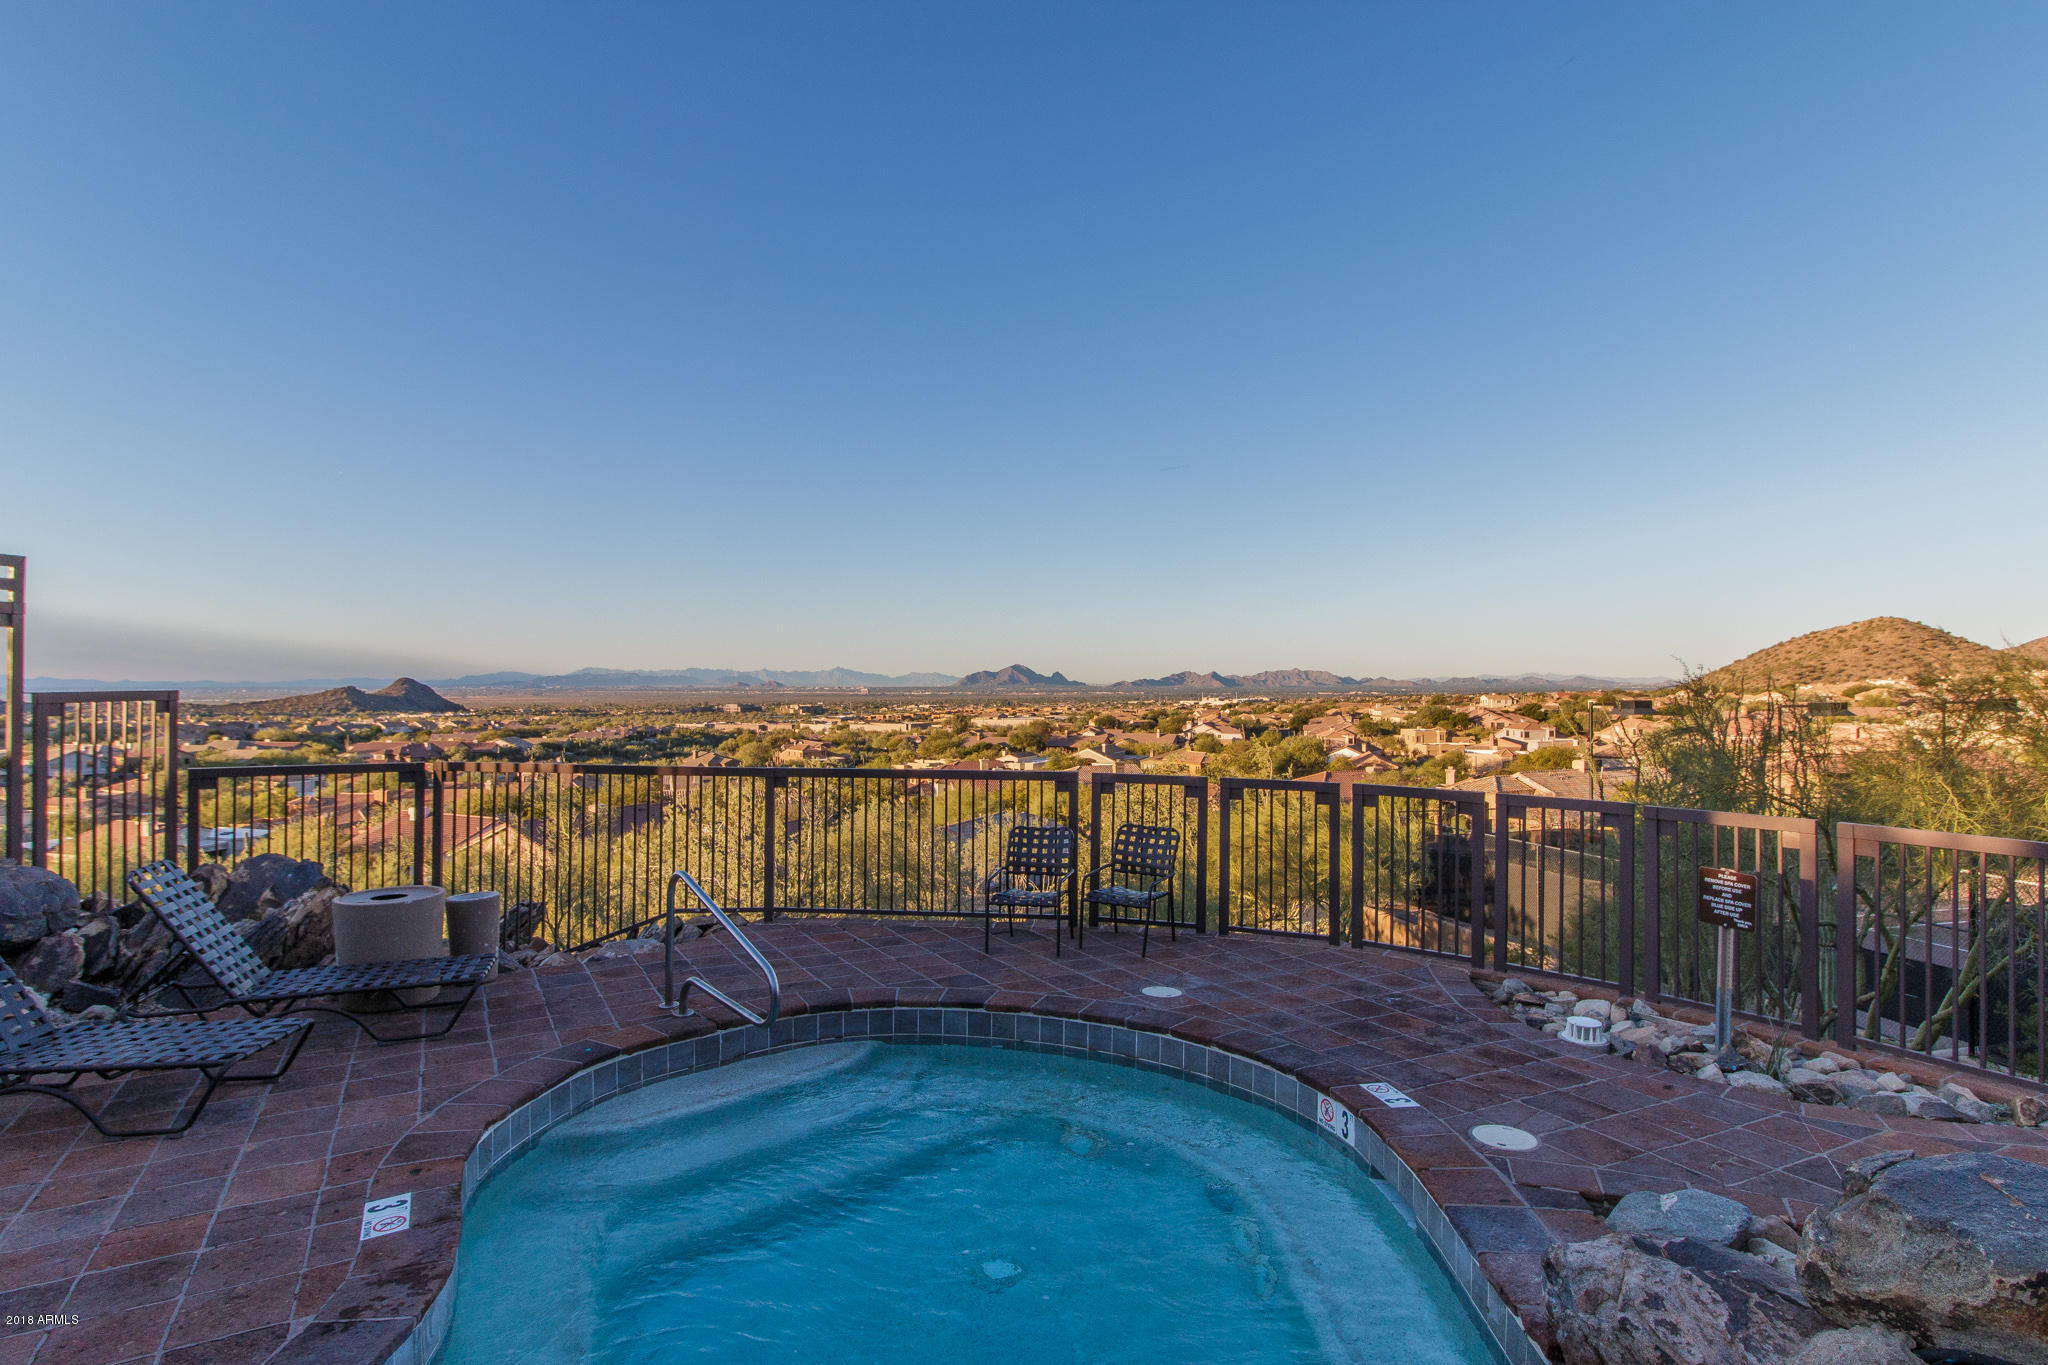 MLS 5728744 12475 N 134TH Way, Scottsdale, AZ 85259 Scottsdale AZ Scottsdale Mountain